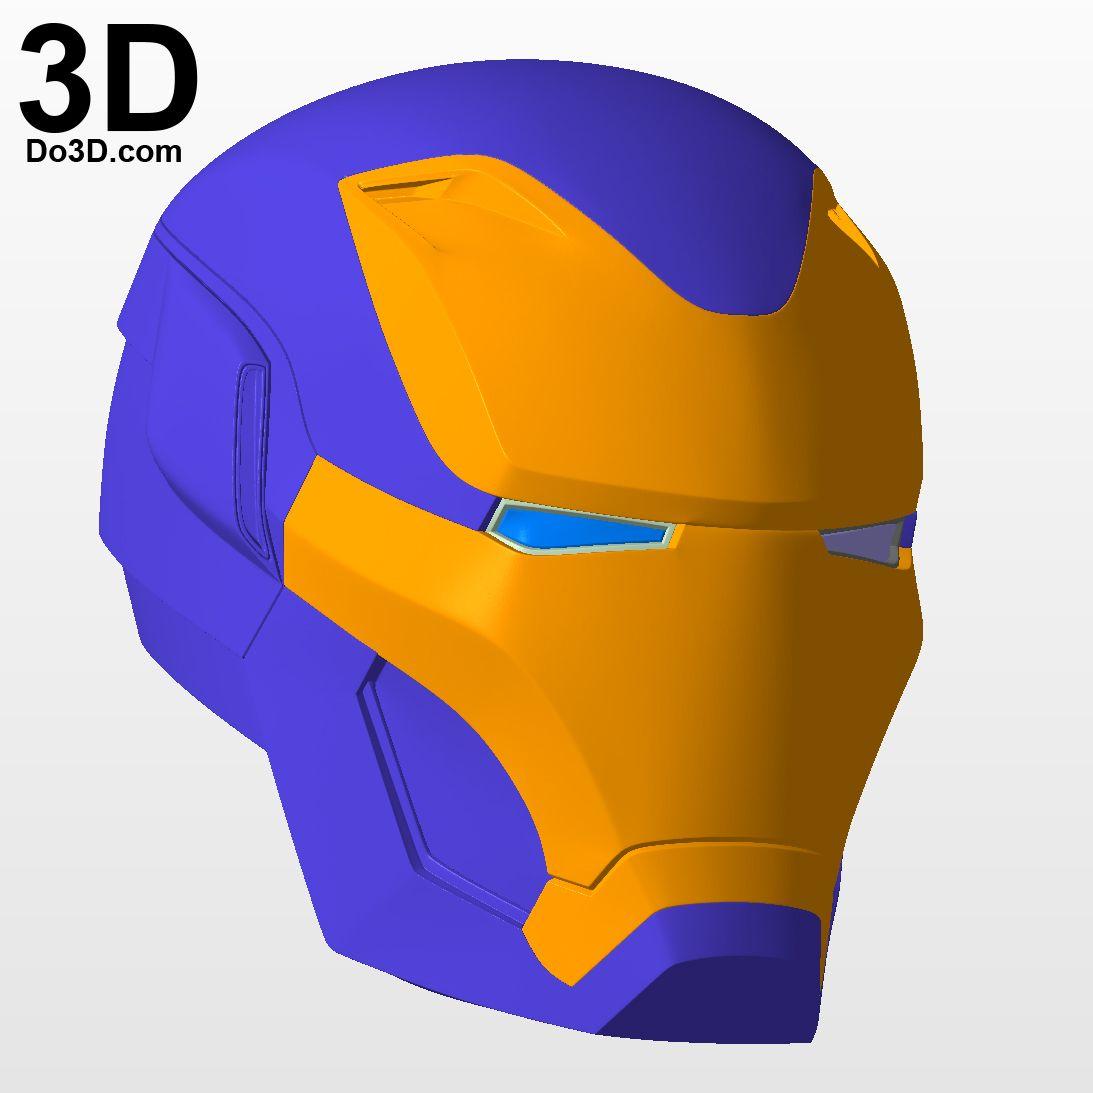 3D Printable Model: Iron Man Mark L MK 50 Avengers Infinity